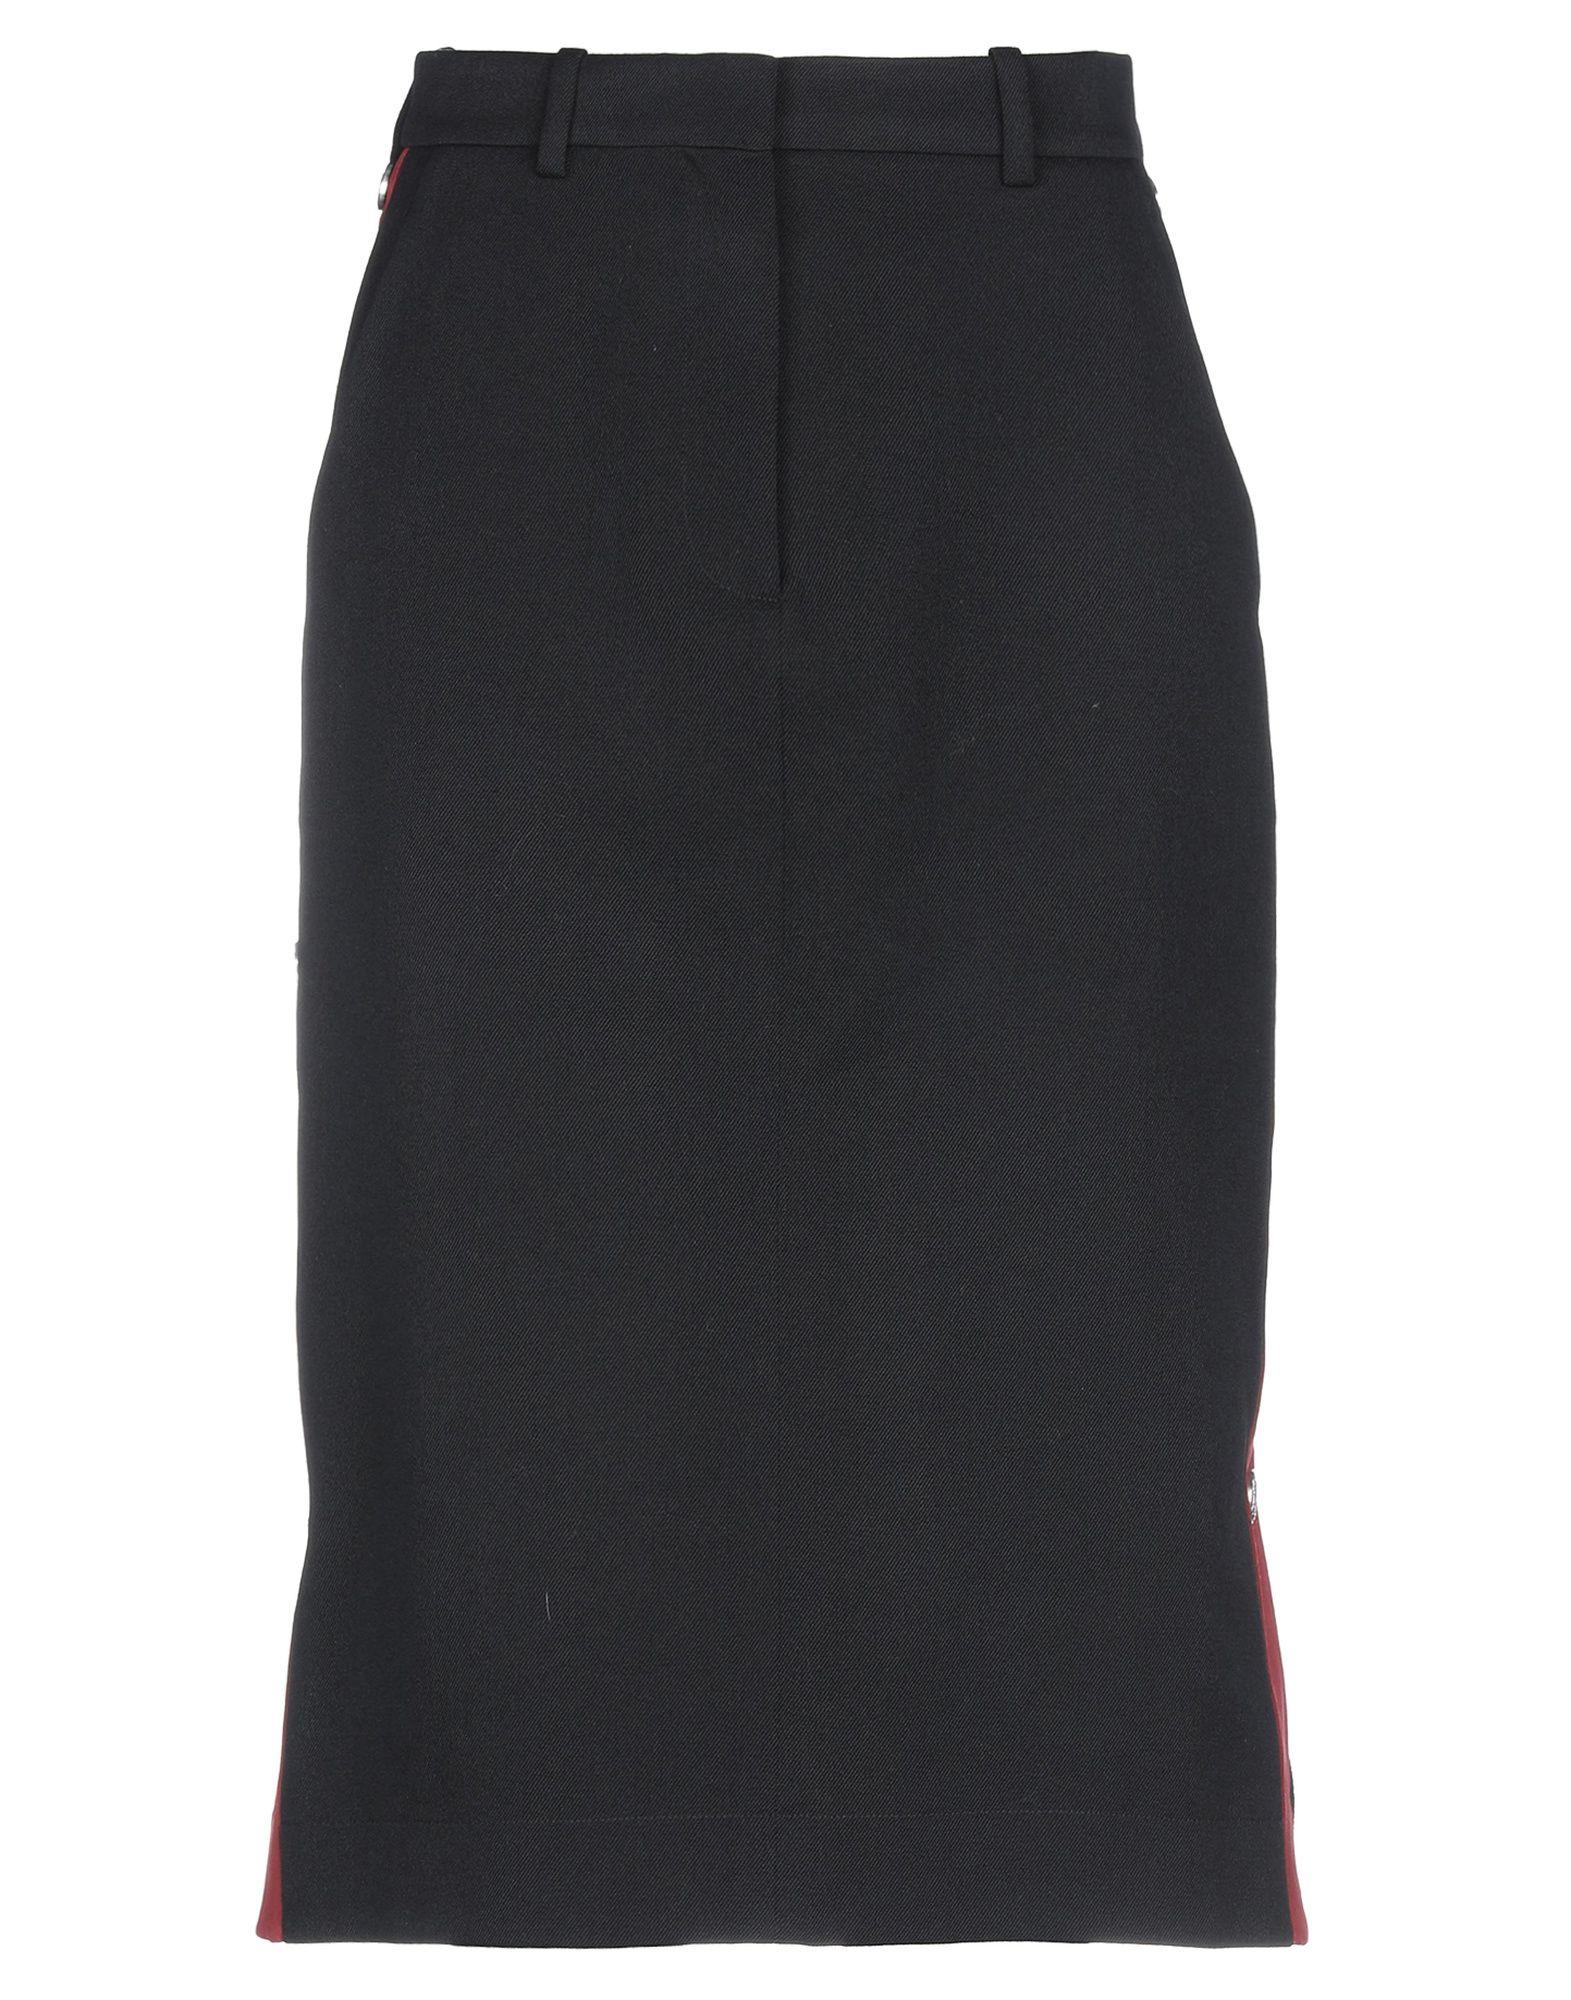 Фото - CALVIN KLEIN 205W39NYC Юбка длиной 3/4 calvin klein collection юбка длиной 3 4